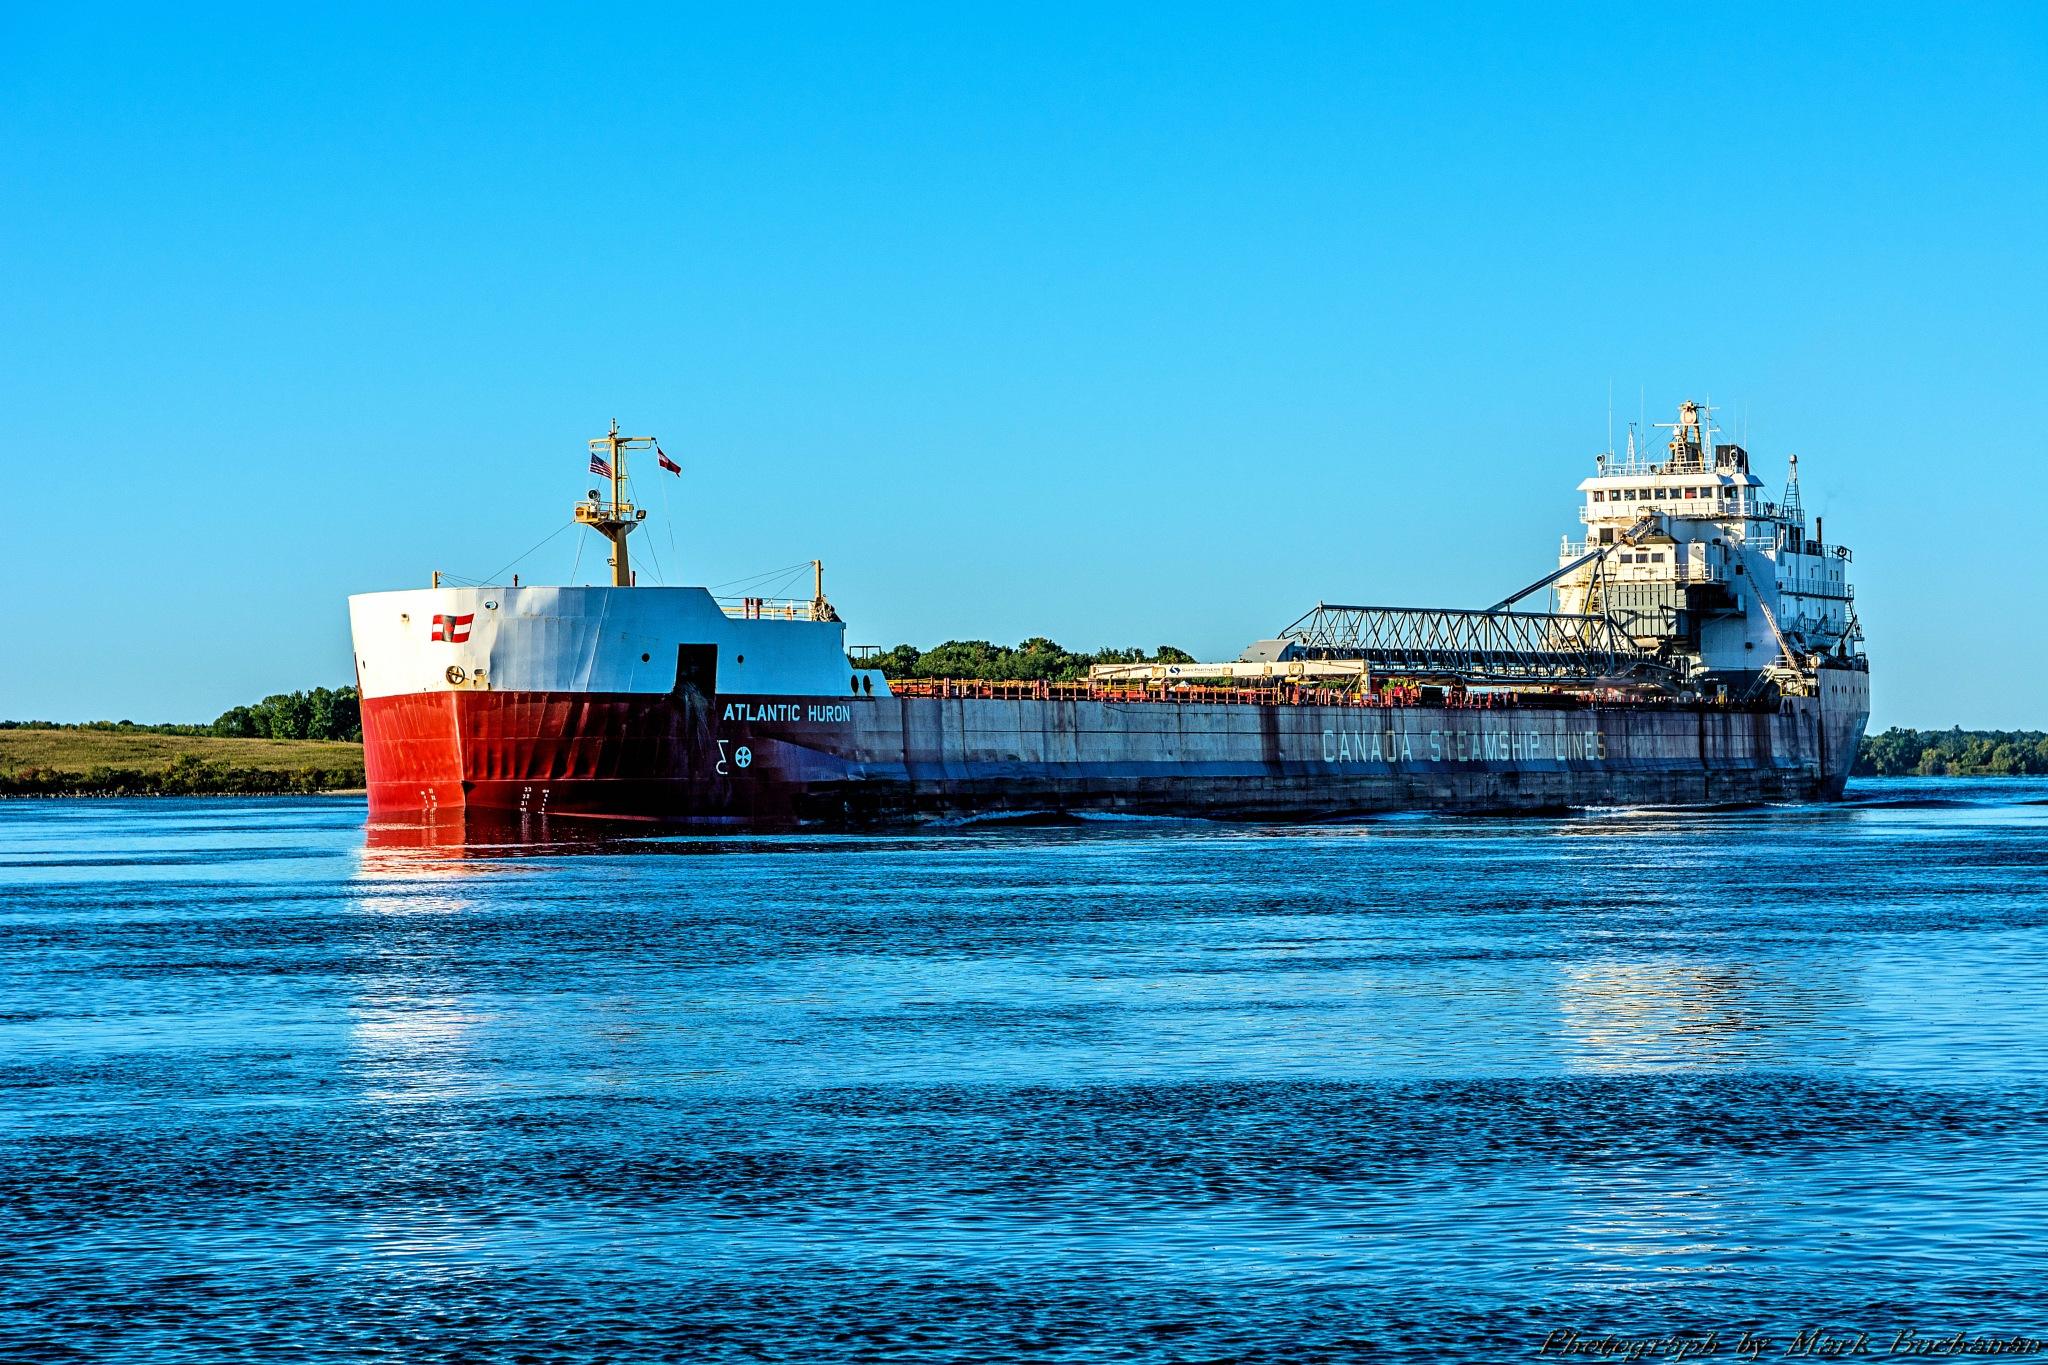 East bound freighter #3 by Mark Buchanan